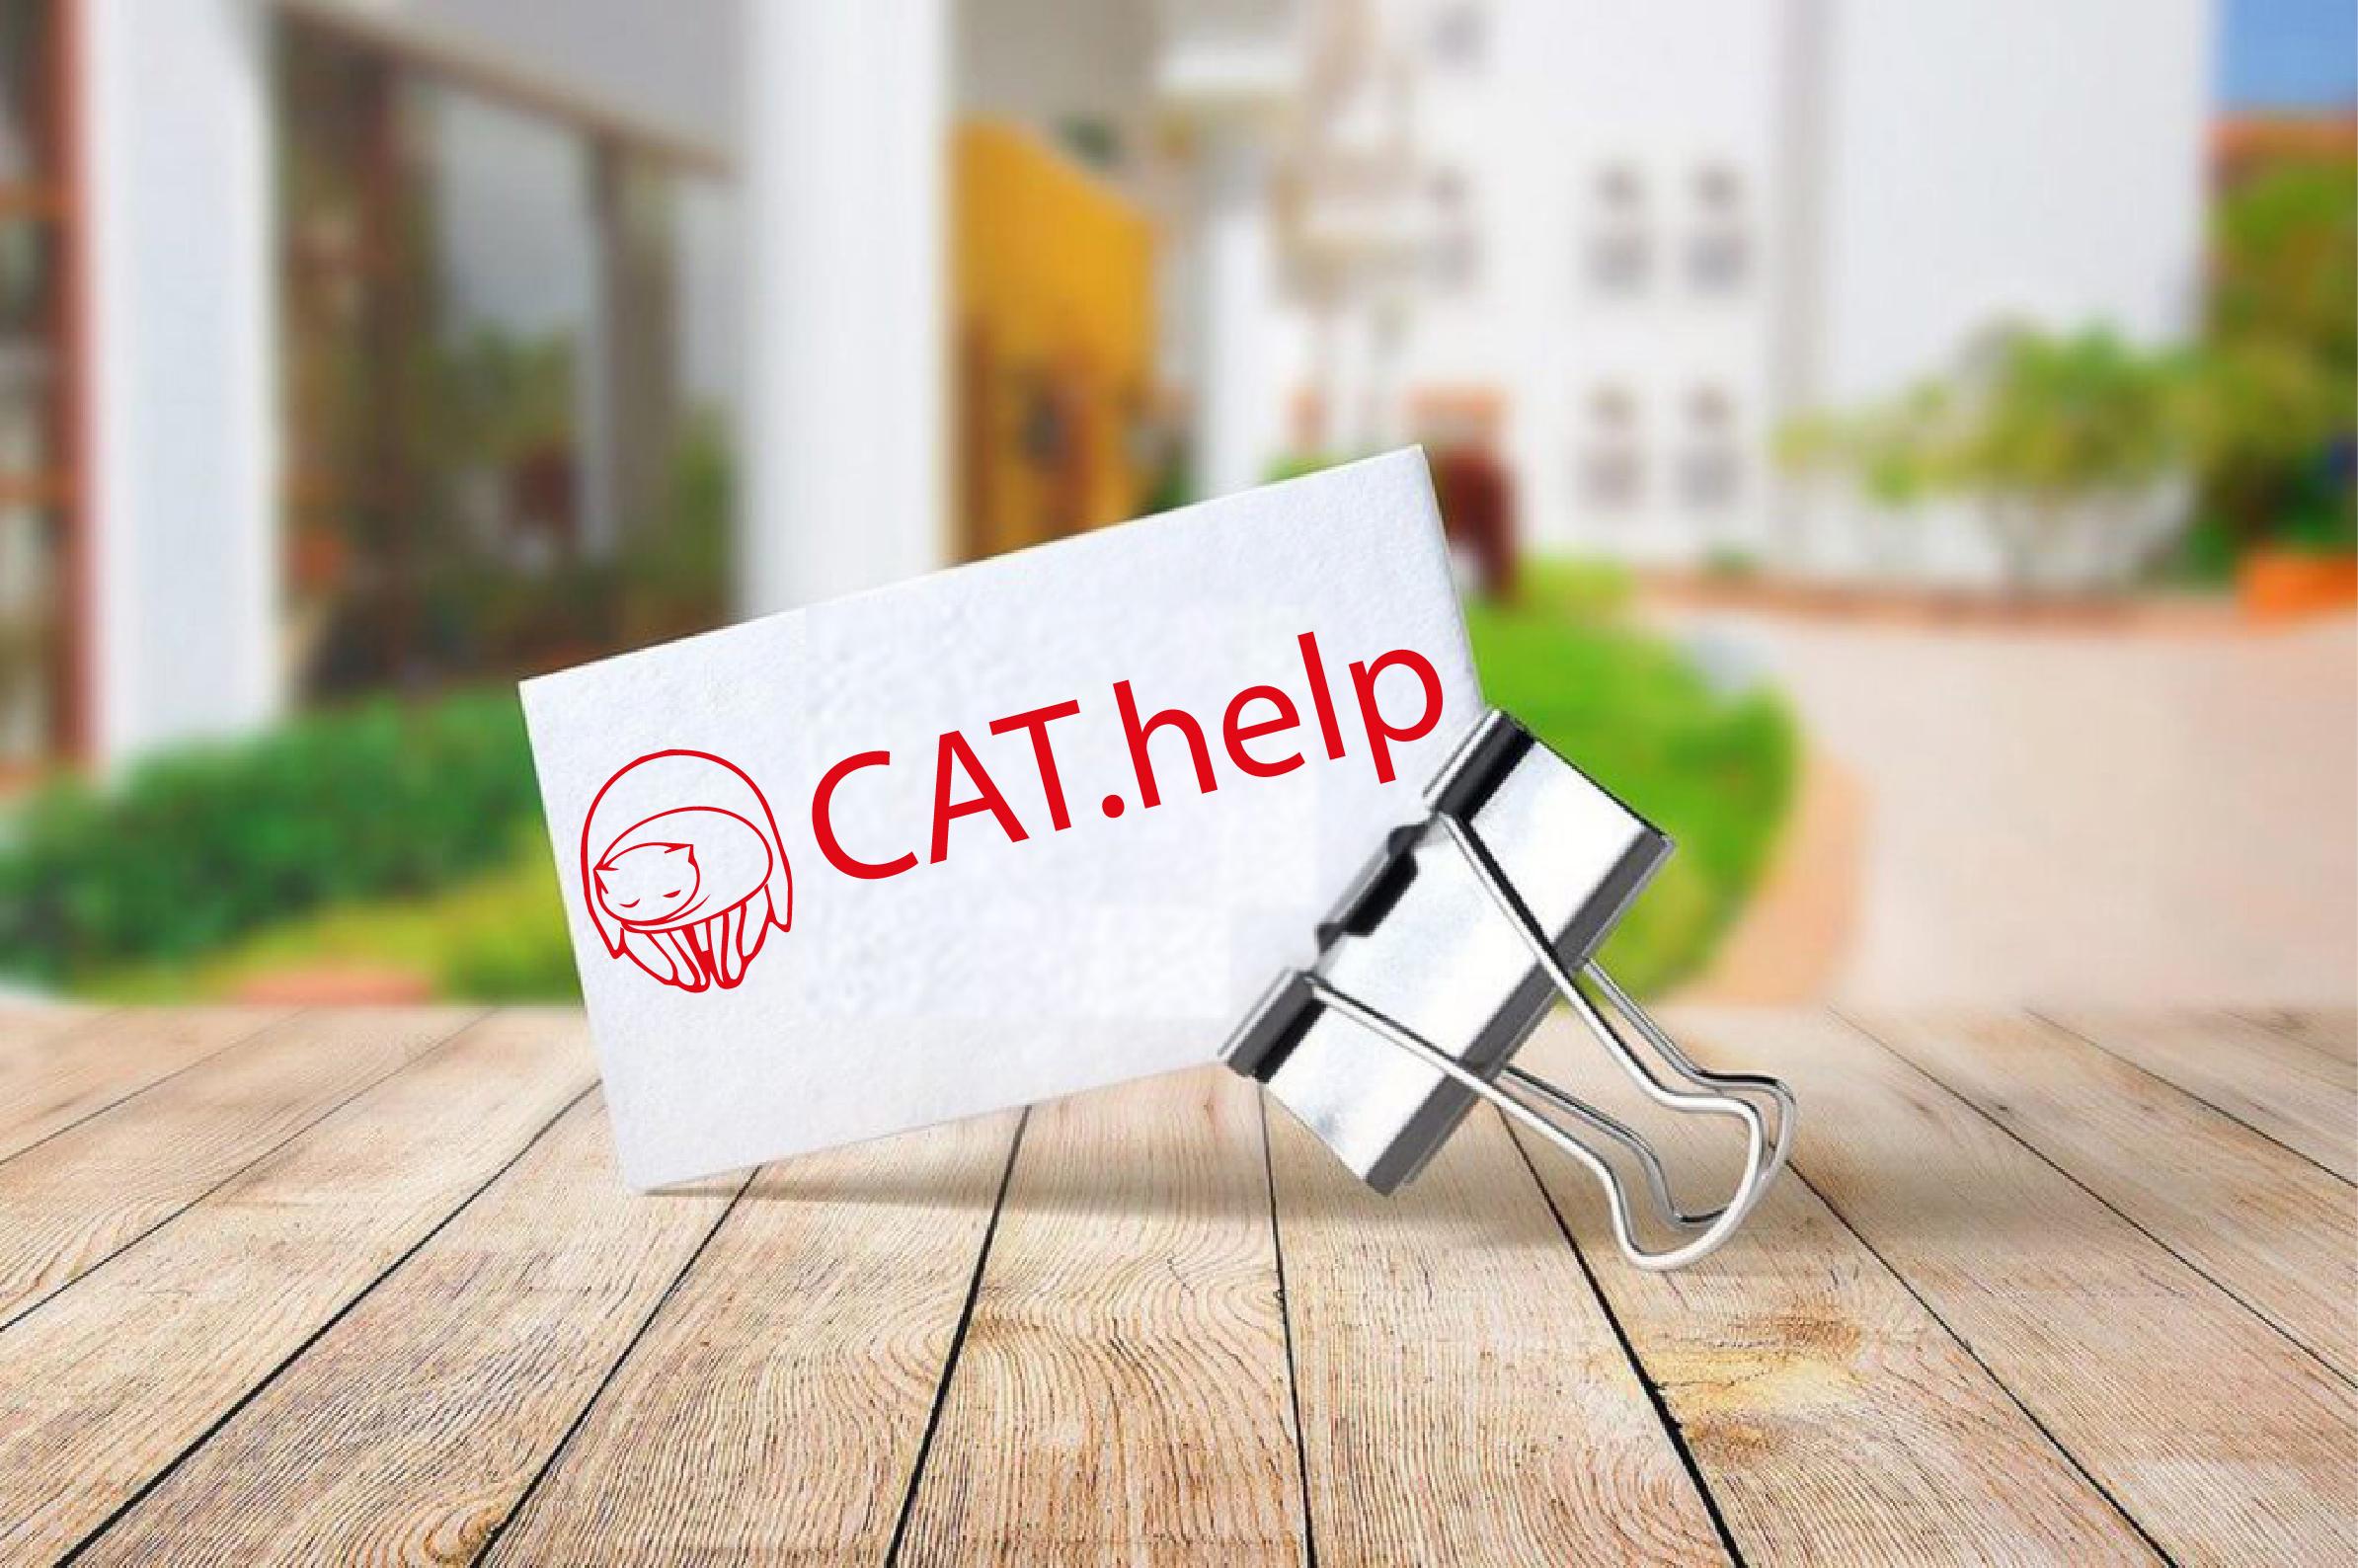 логотип для сайта и группы вк - cat.help фото f_24659db9eff2cbc0.jpg